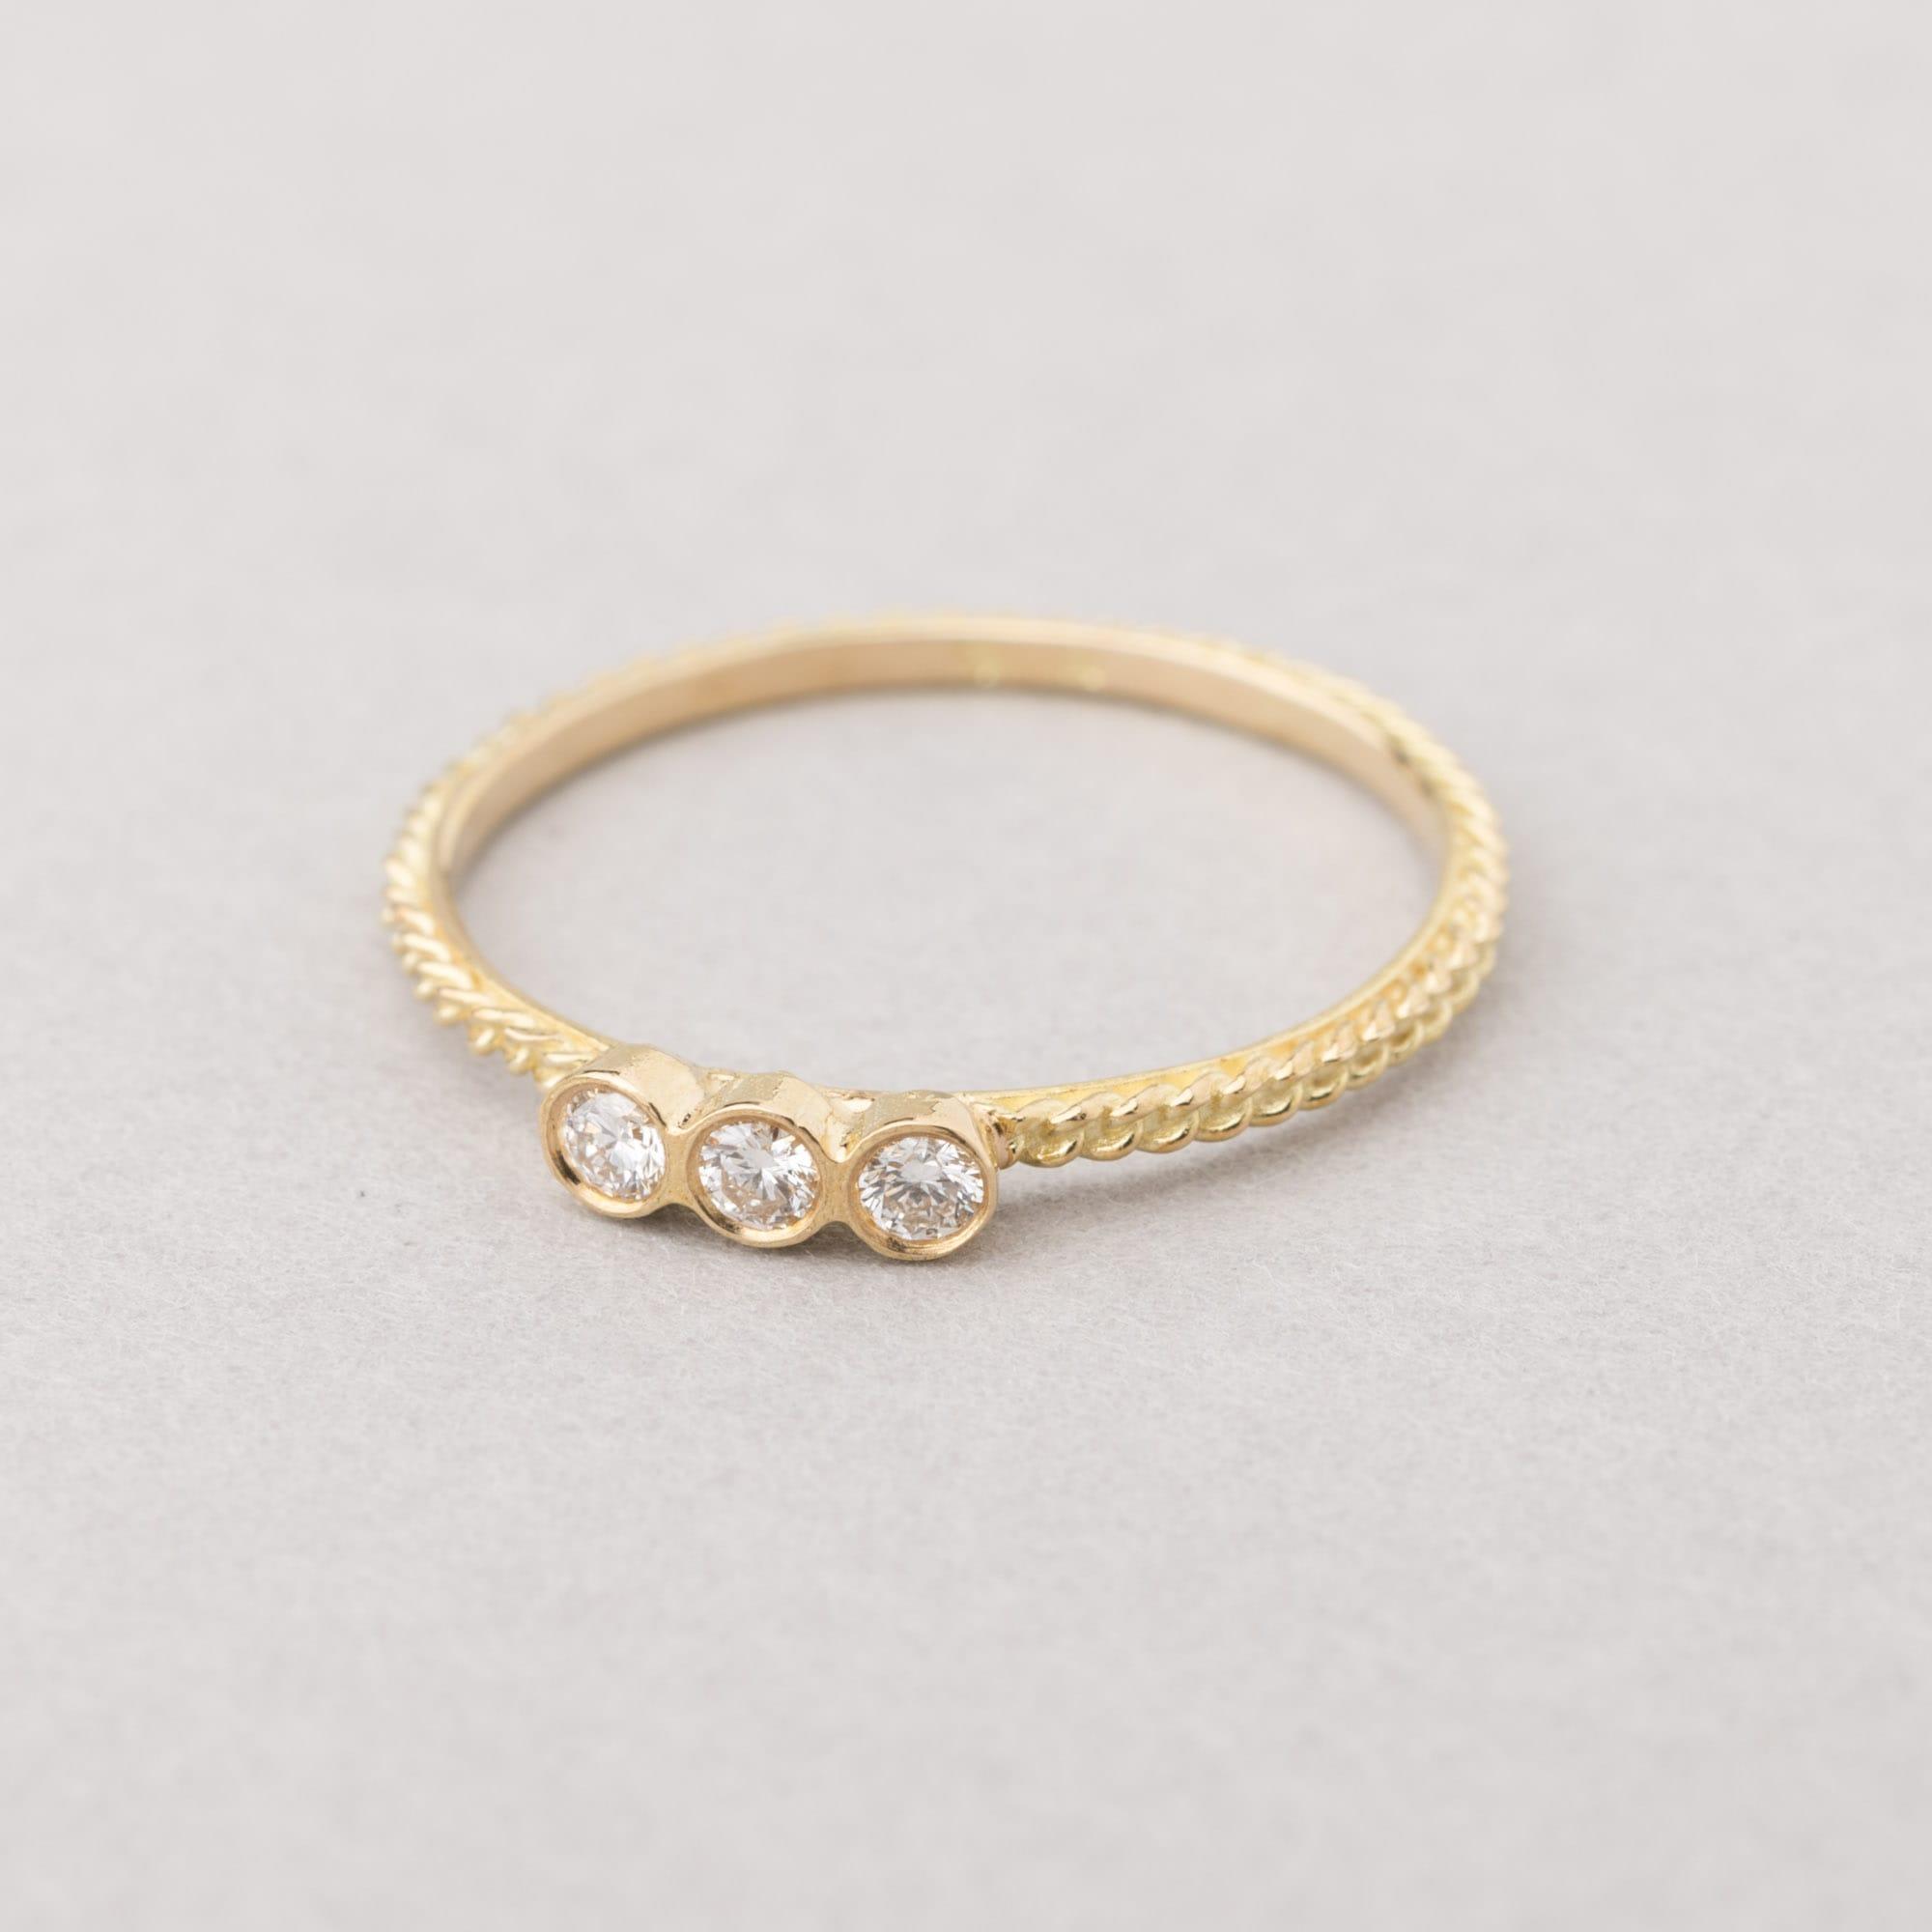 Wouters & Hendrix Gold - Ring with three diamonds. ⋆ LockStock